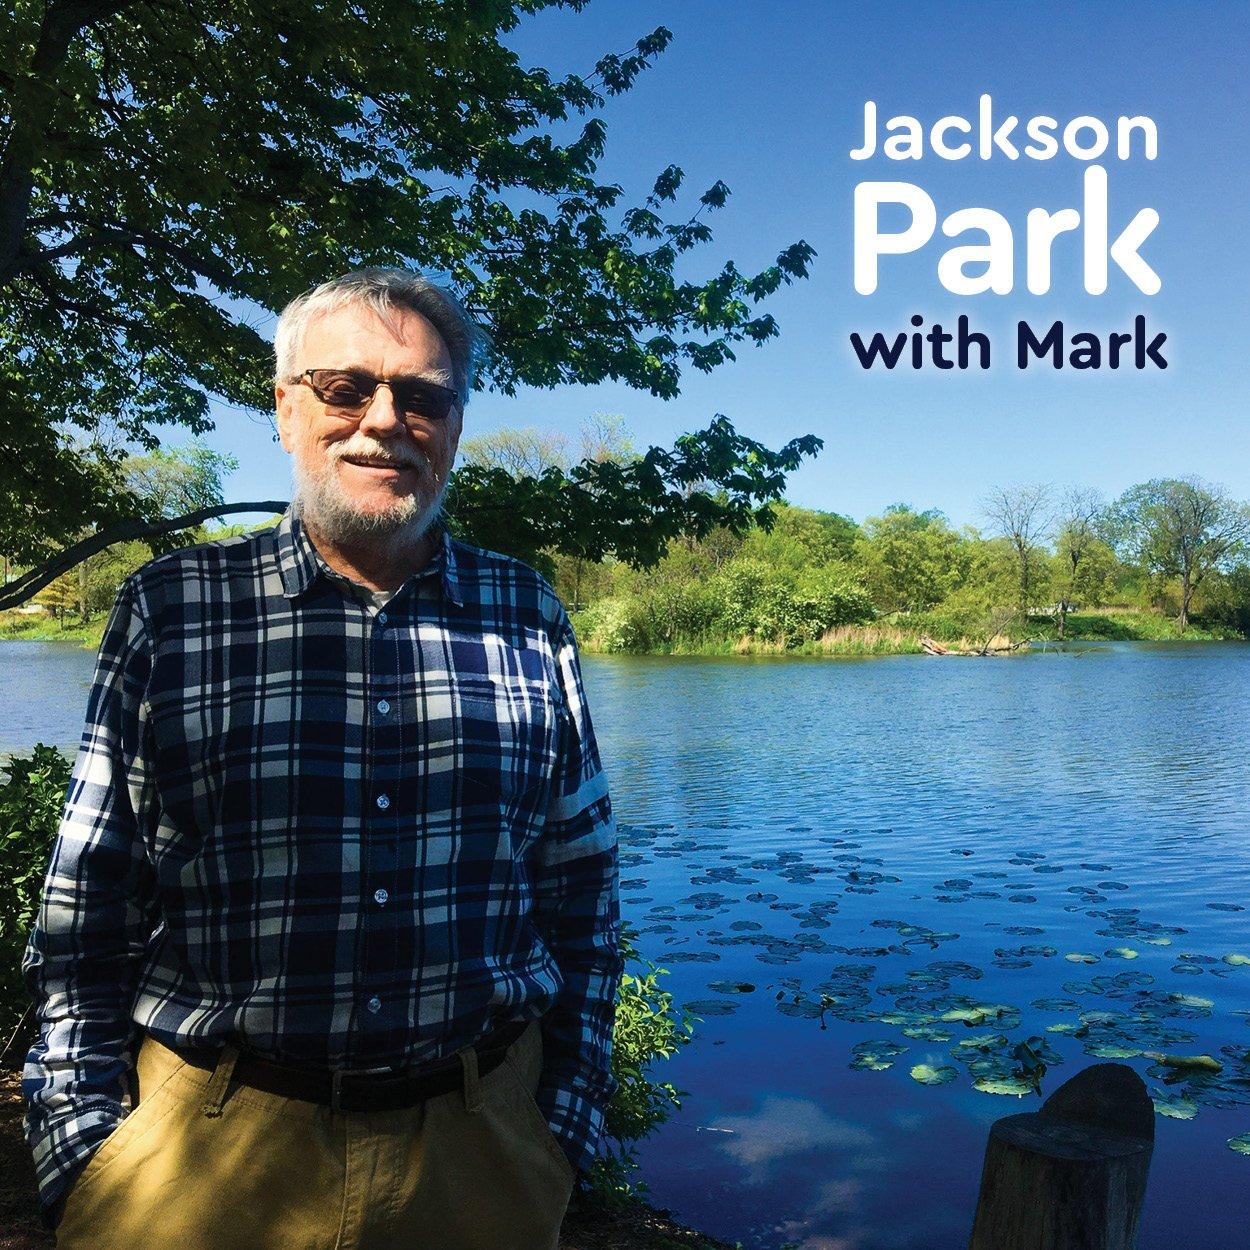 Mark at Jackson Park